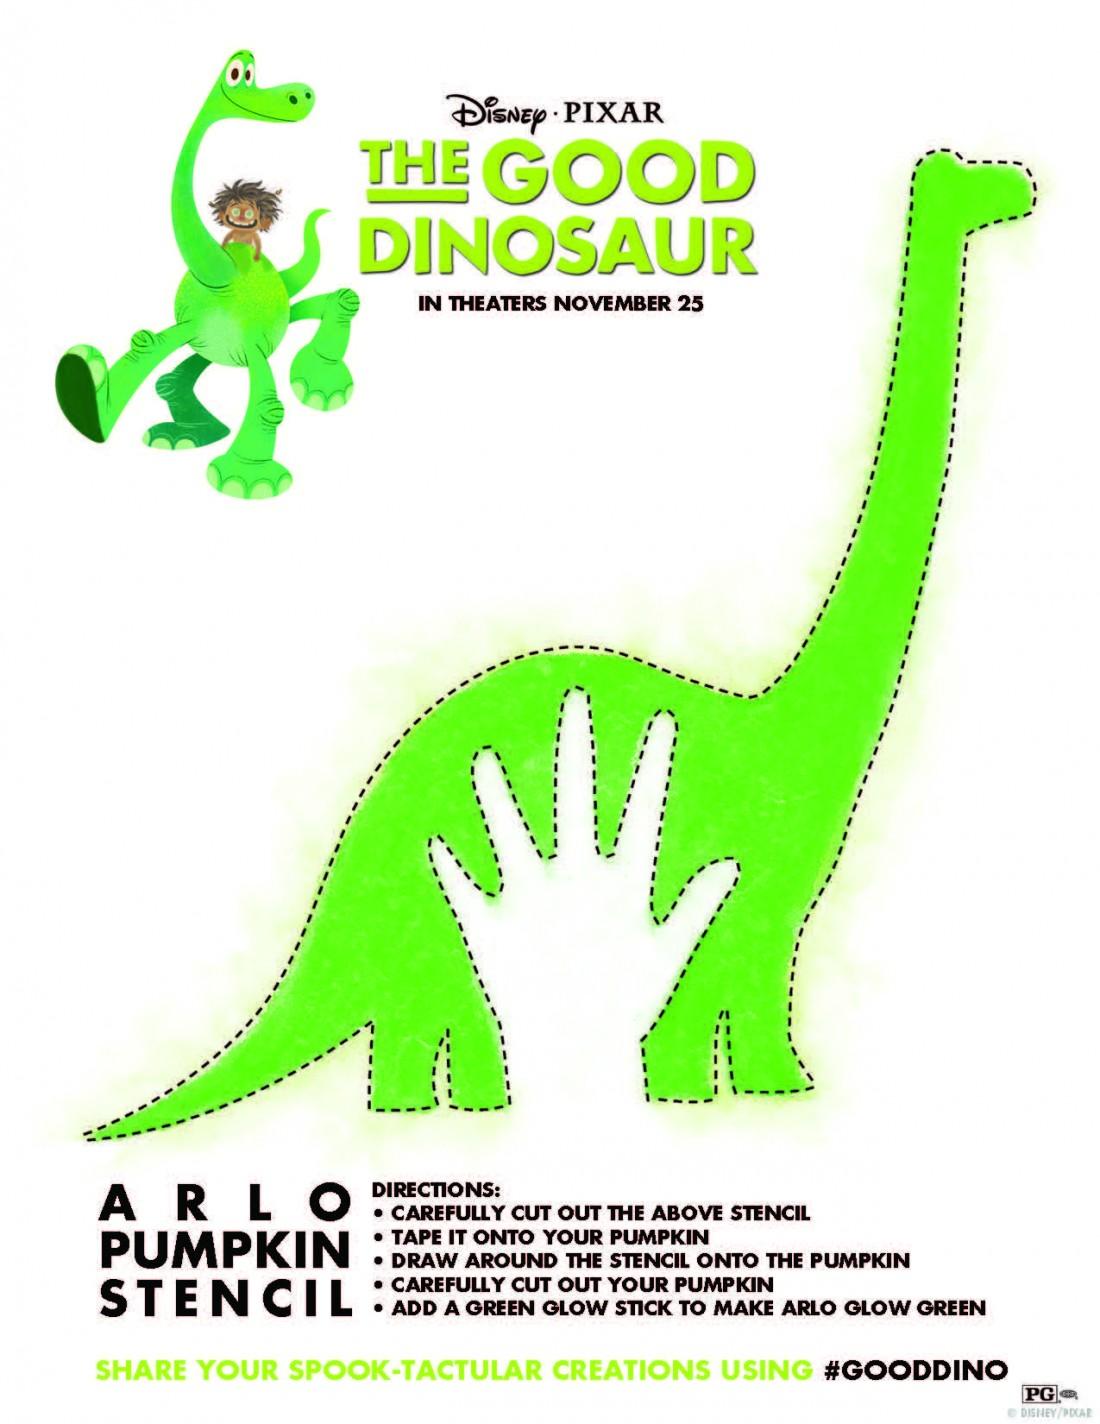 The Good Dinosaur Pumpkin Stencil & Other Printable Activity Sheets ...